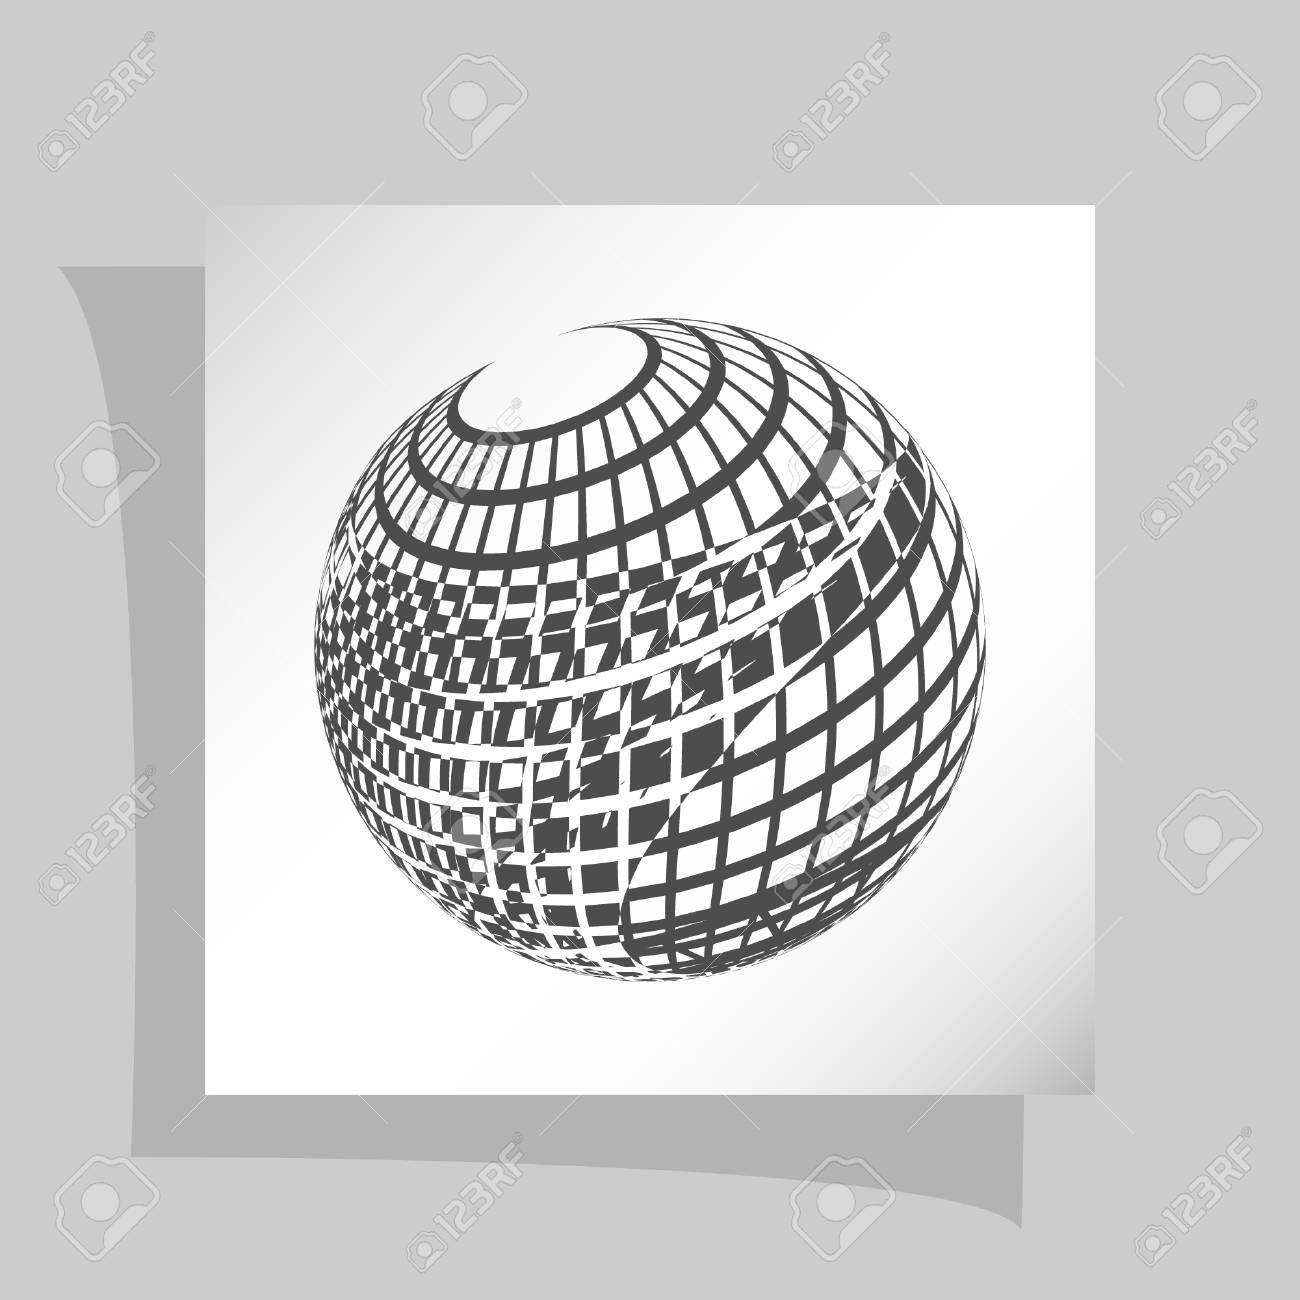 Wire-frame Design Element. Sphere Stock Vector Illustration Royalty ...